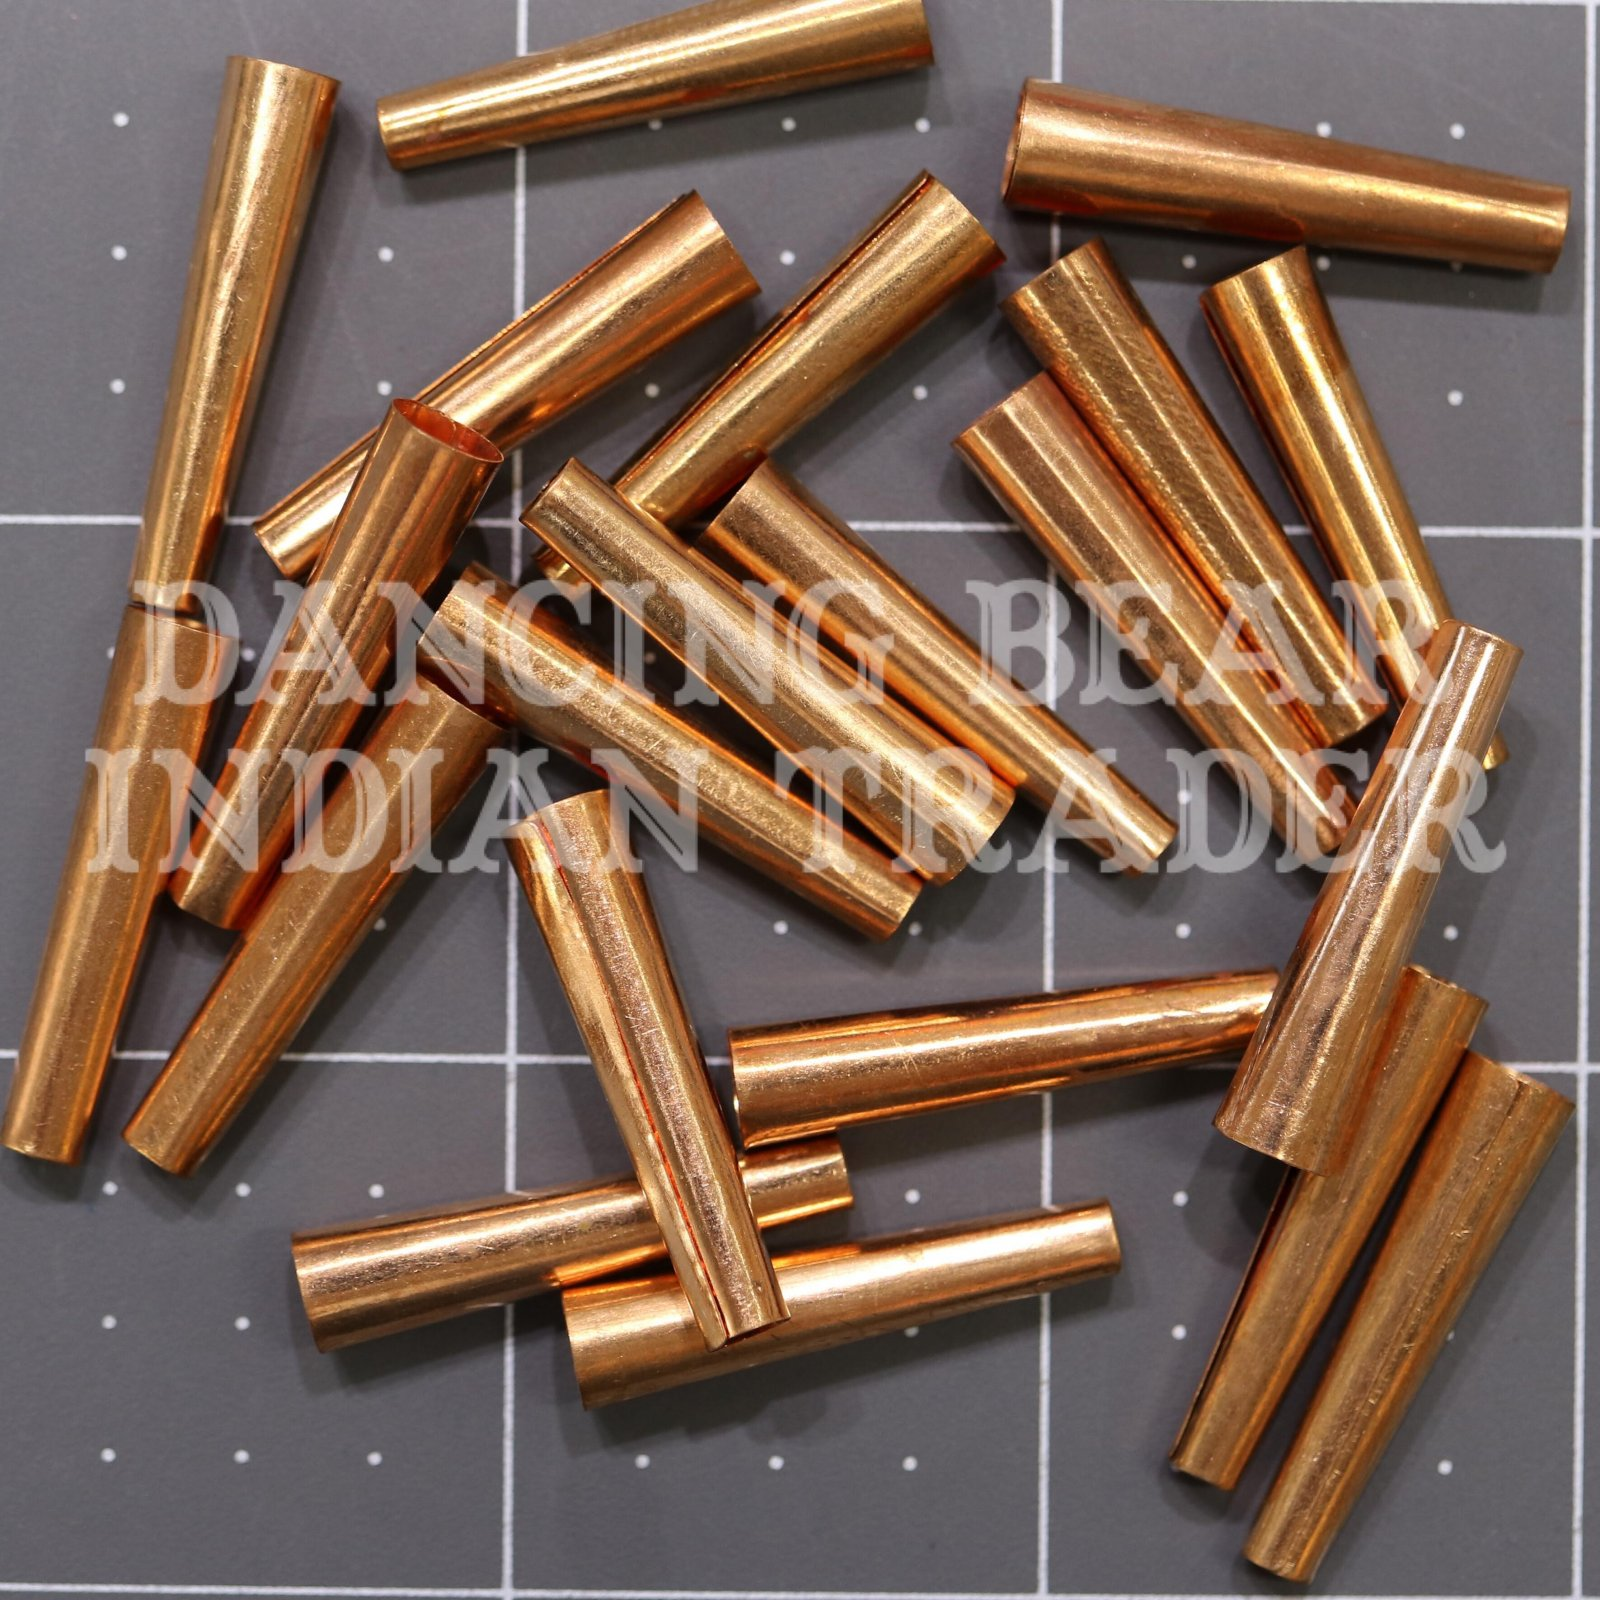 1 Copper Cone 100 pcs